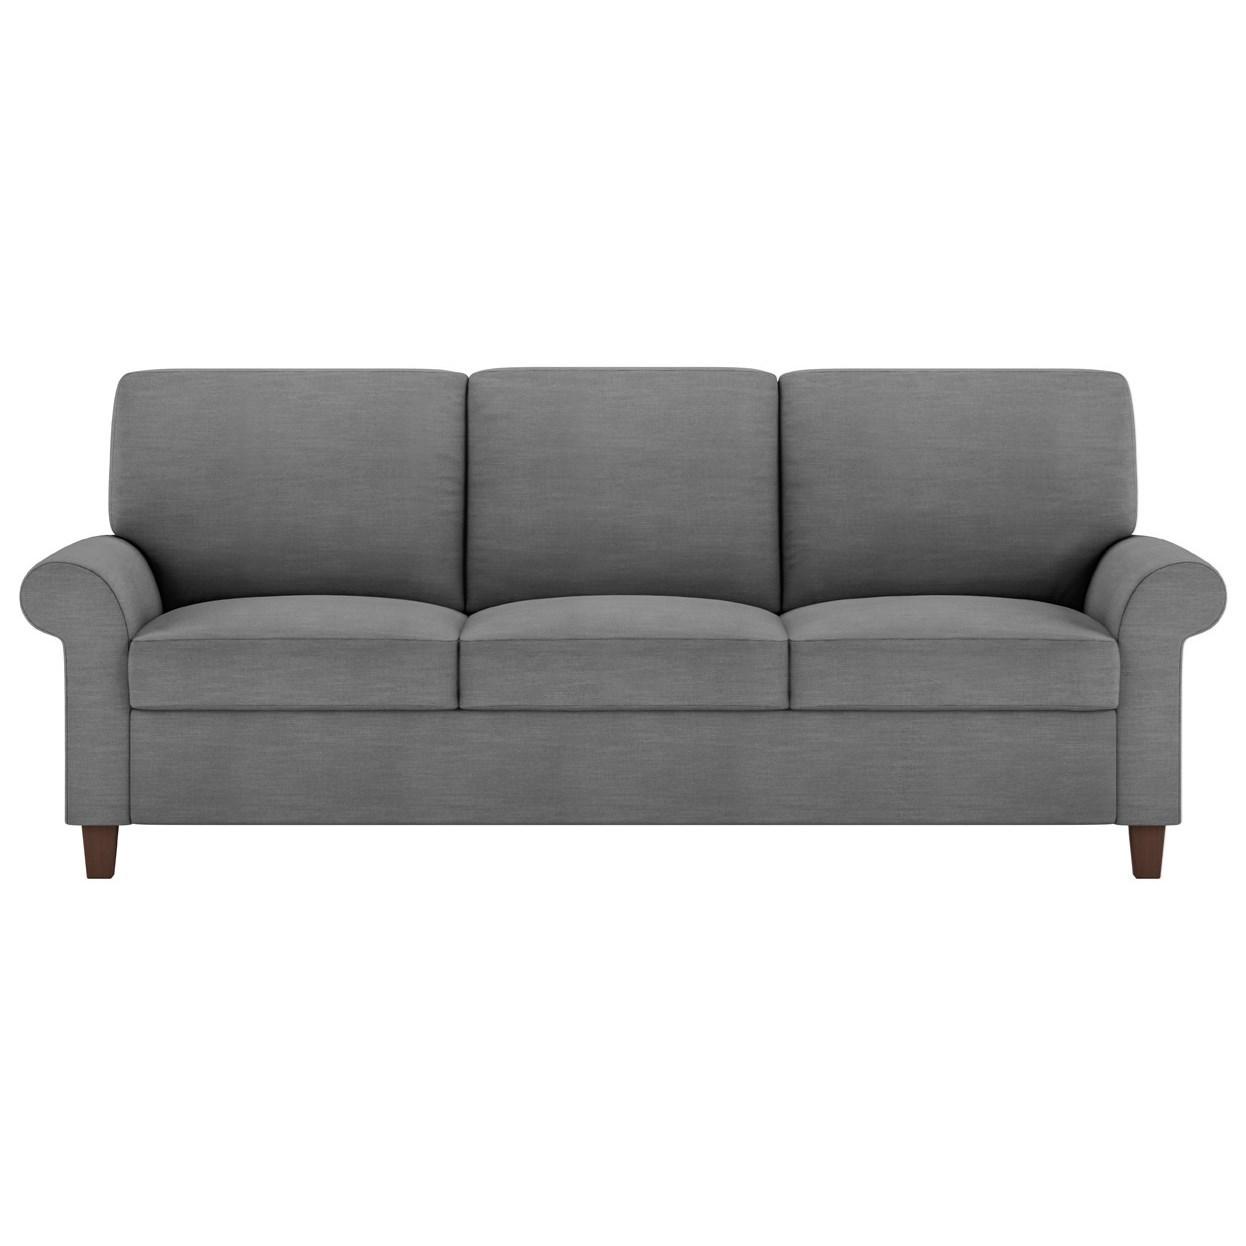 American Leather GibbsKing Sleeper Sofa ...